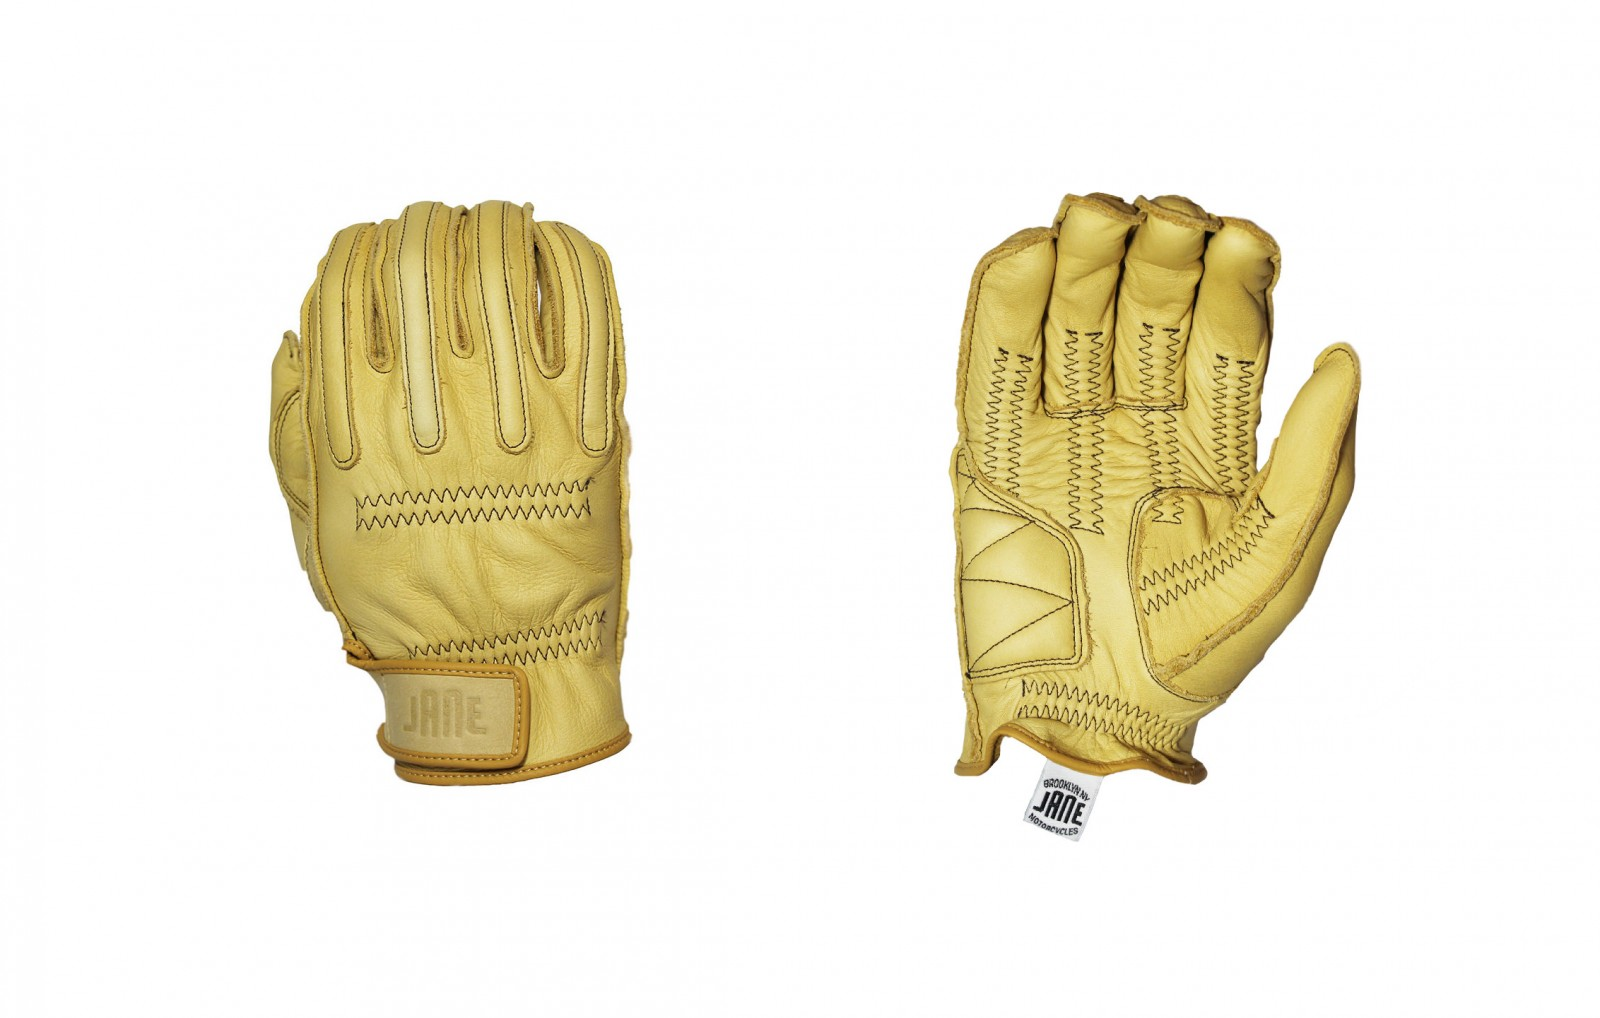 Leather Gloves 1600x1018 - JANE Riding Gloves